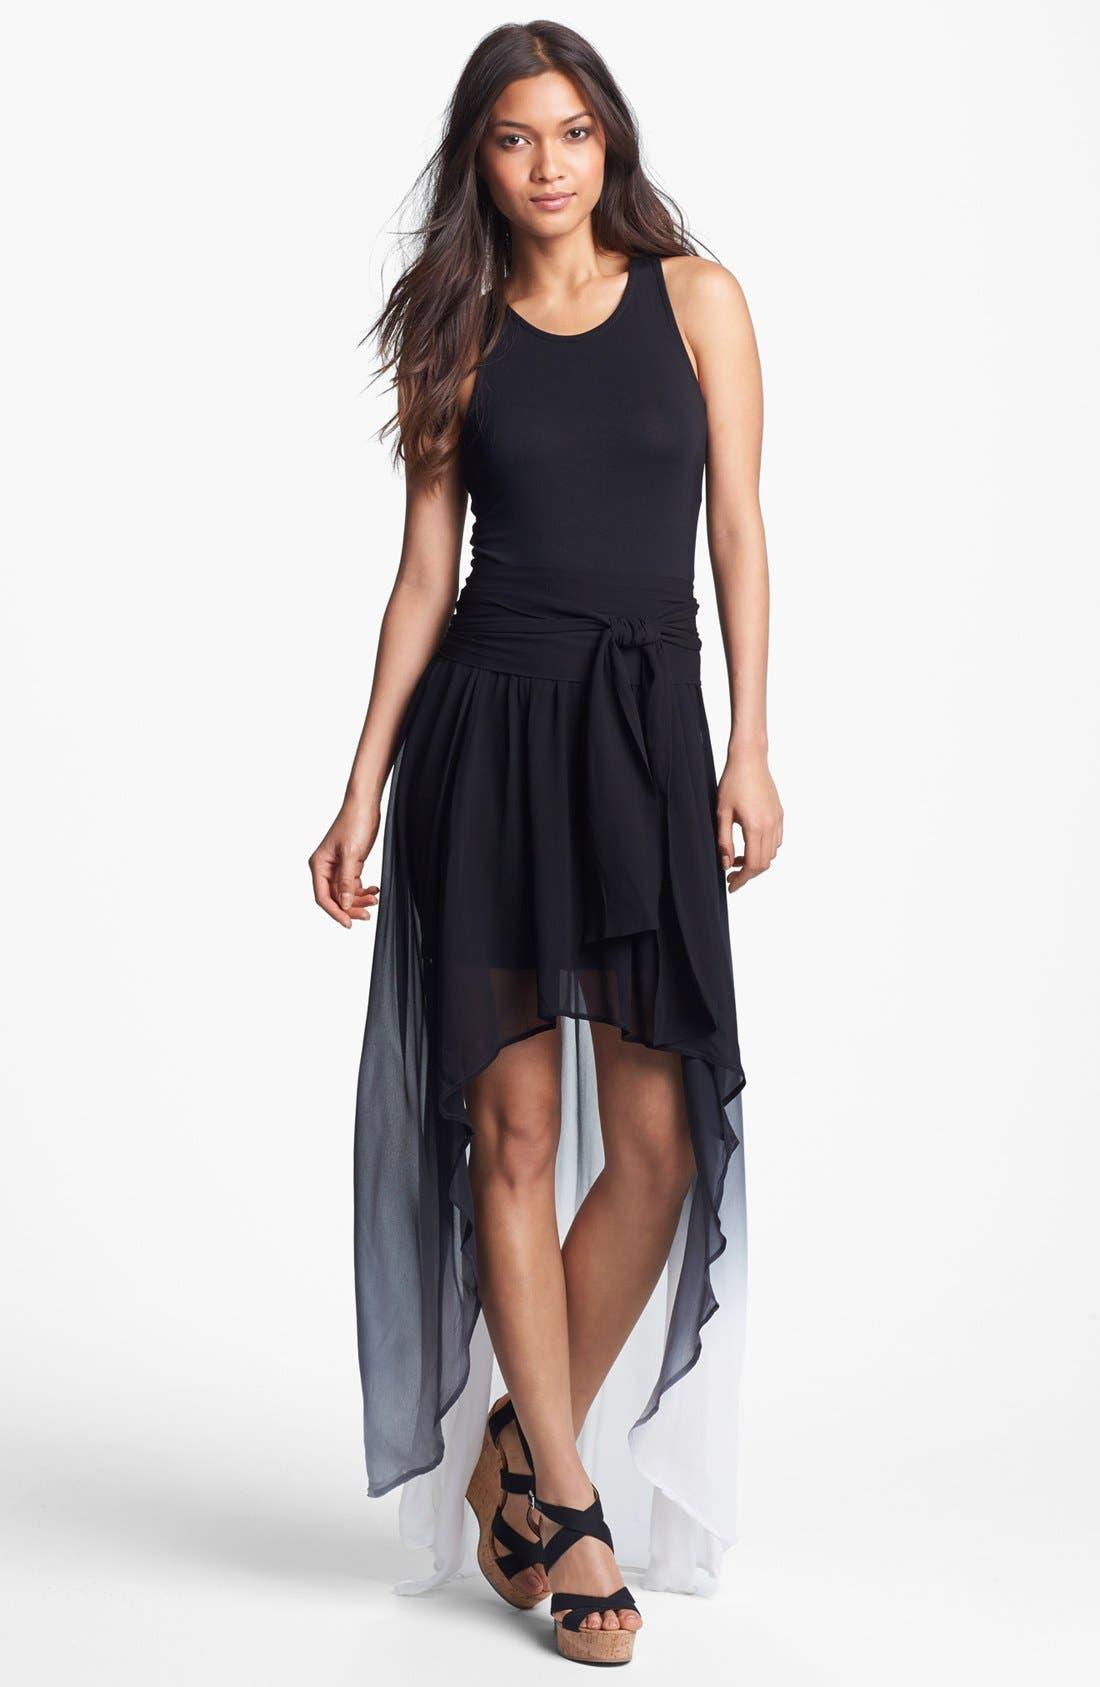 Alternate Image 1 Selected - Young, Fabulous & Broke 'Kula' Ombré Maxi Dress